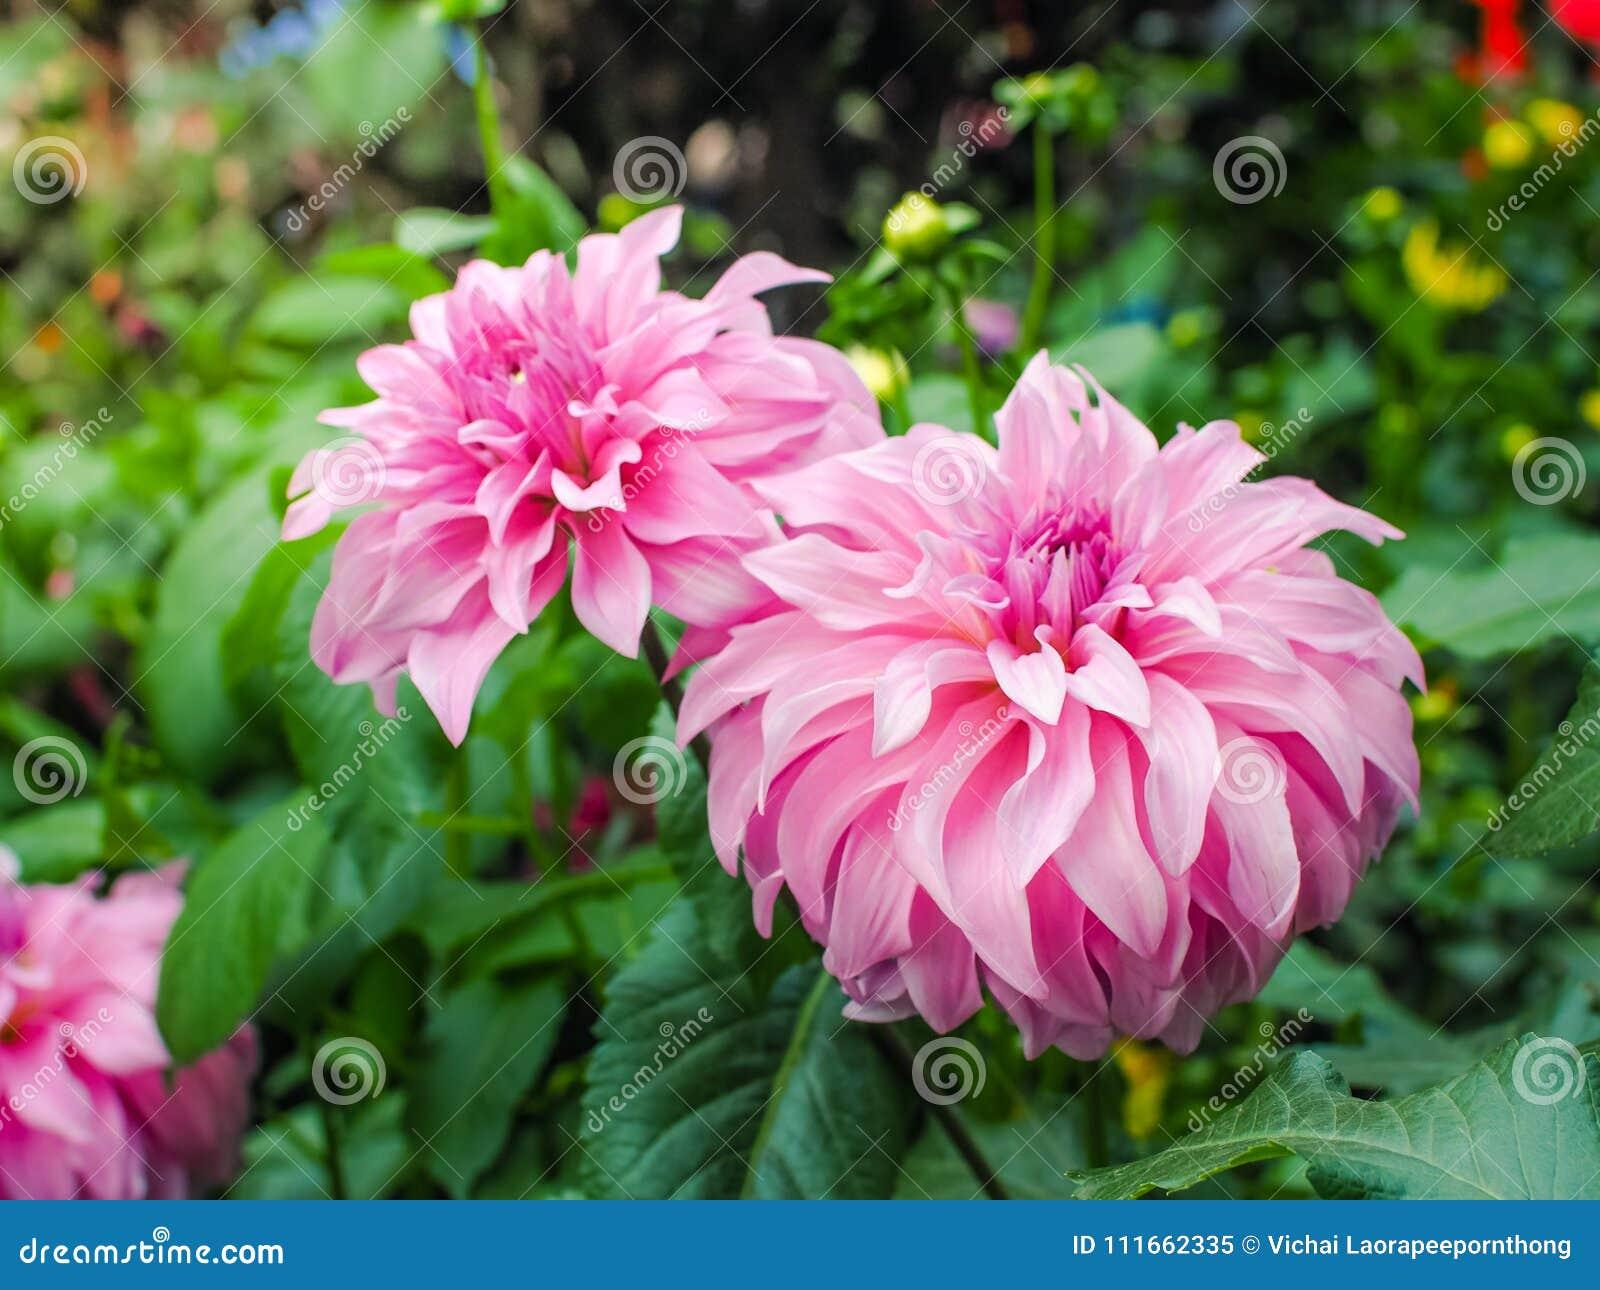 Beautiful pink dahlia flower in garden stock image image of download beautiful pink dahlia flower in garden stock image image of garden bloom izmirmasajfo